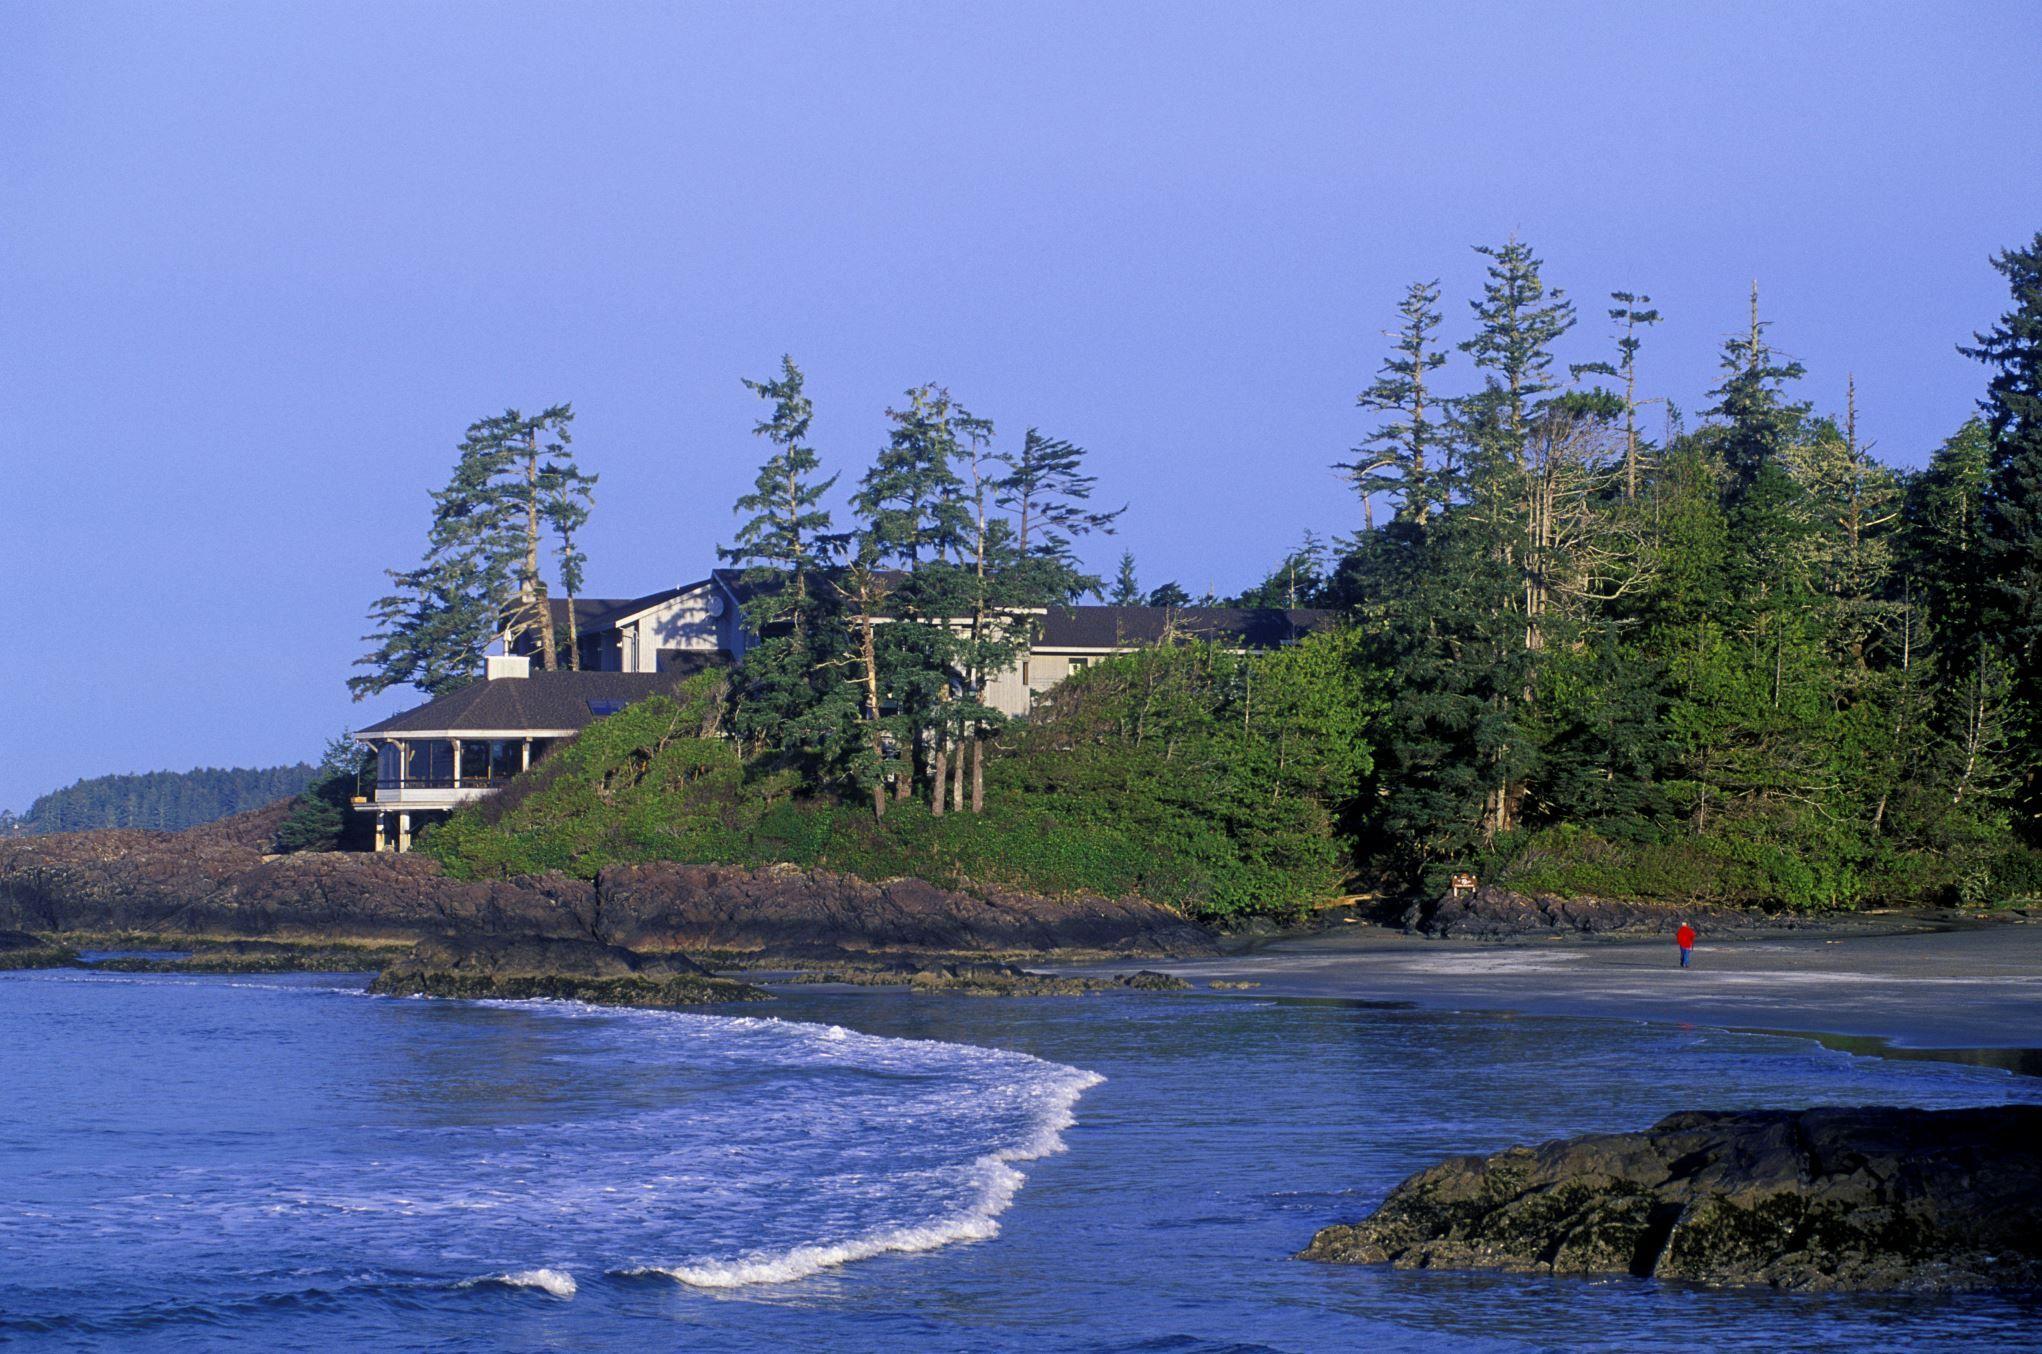 Chestermans Beach, Wickaninish Inn, Clayoquot Sound